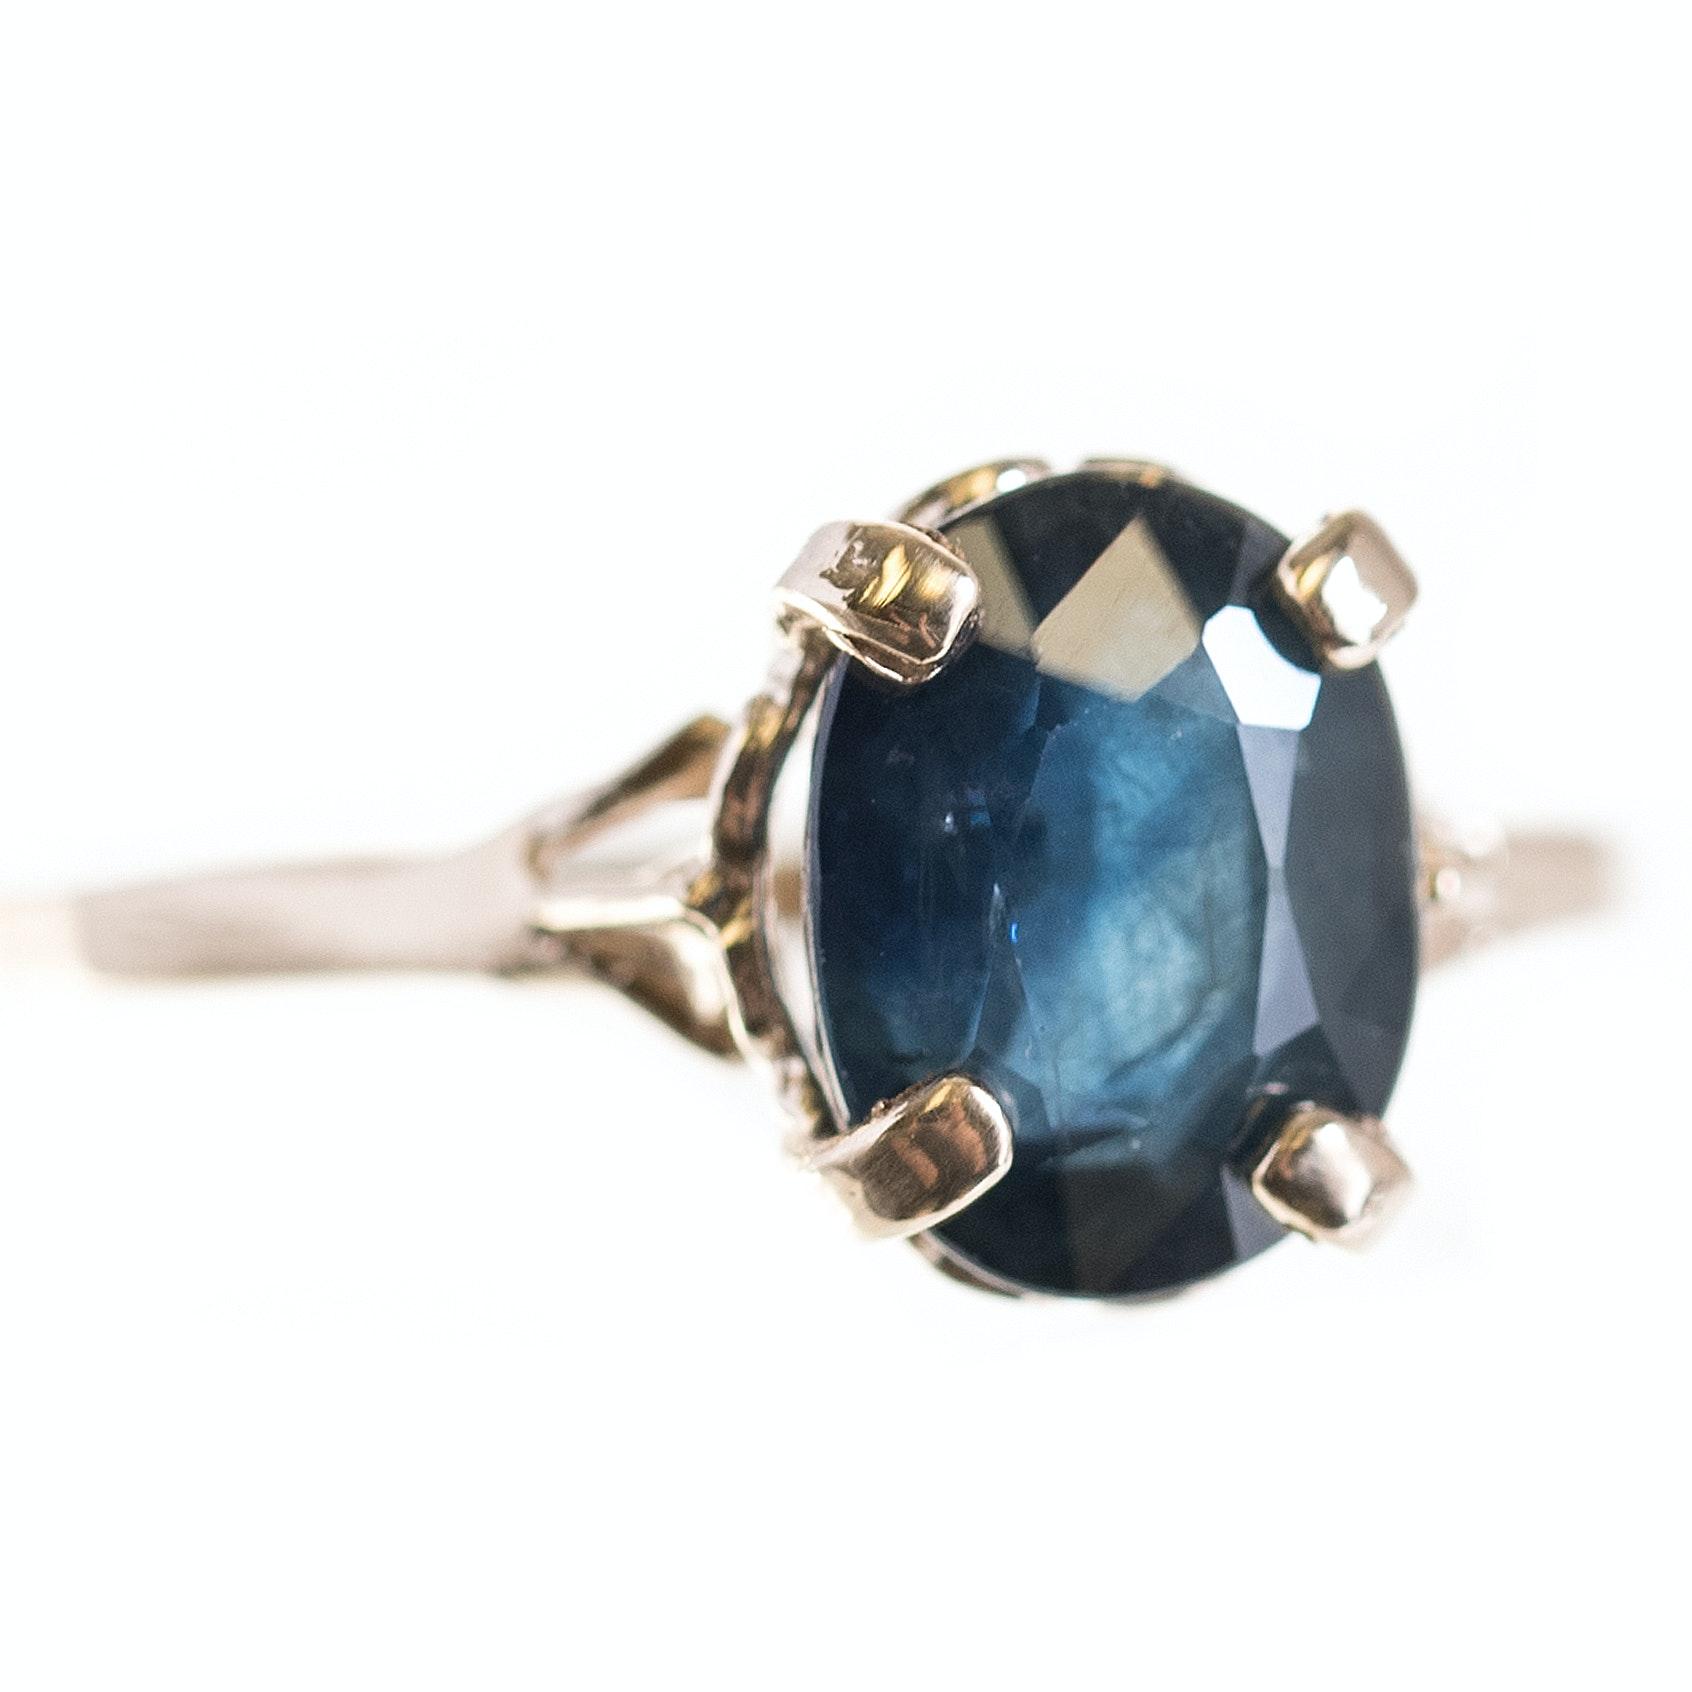 14K Yellow Gold 2.89 Carat Sapphire Ring